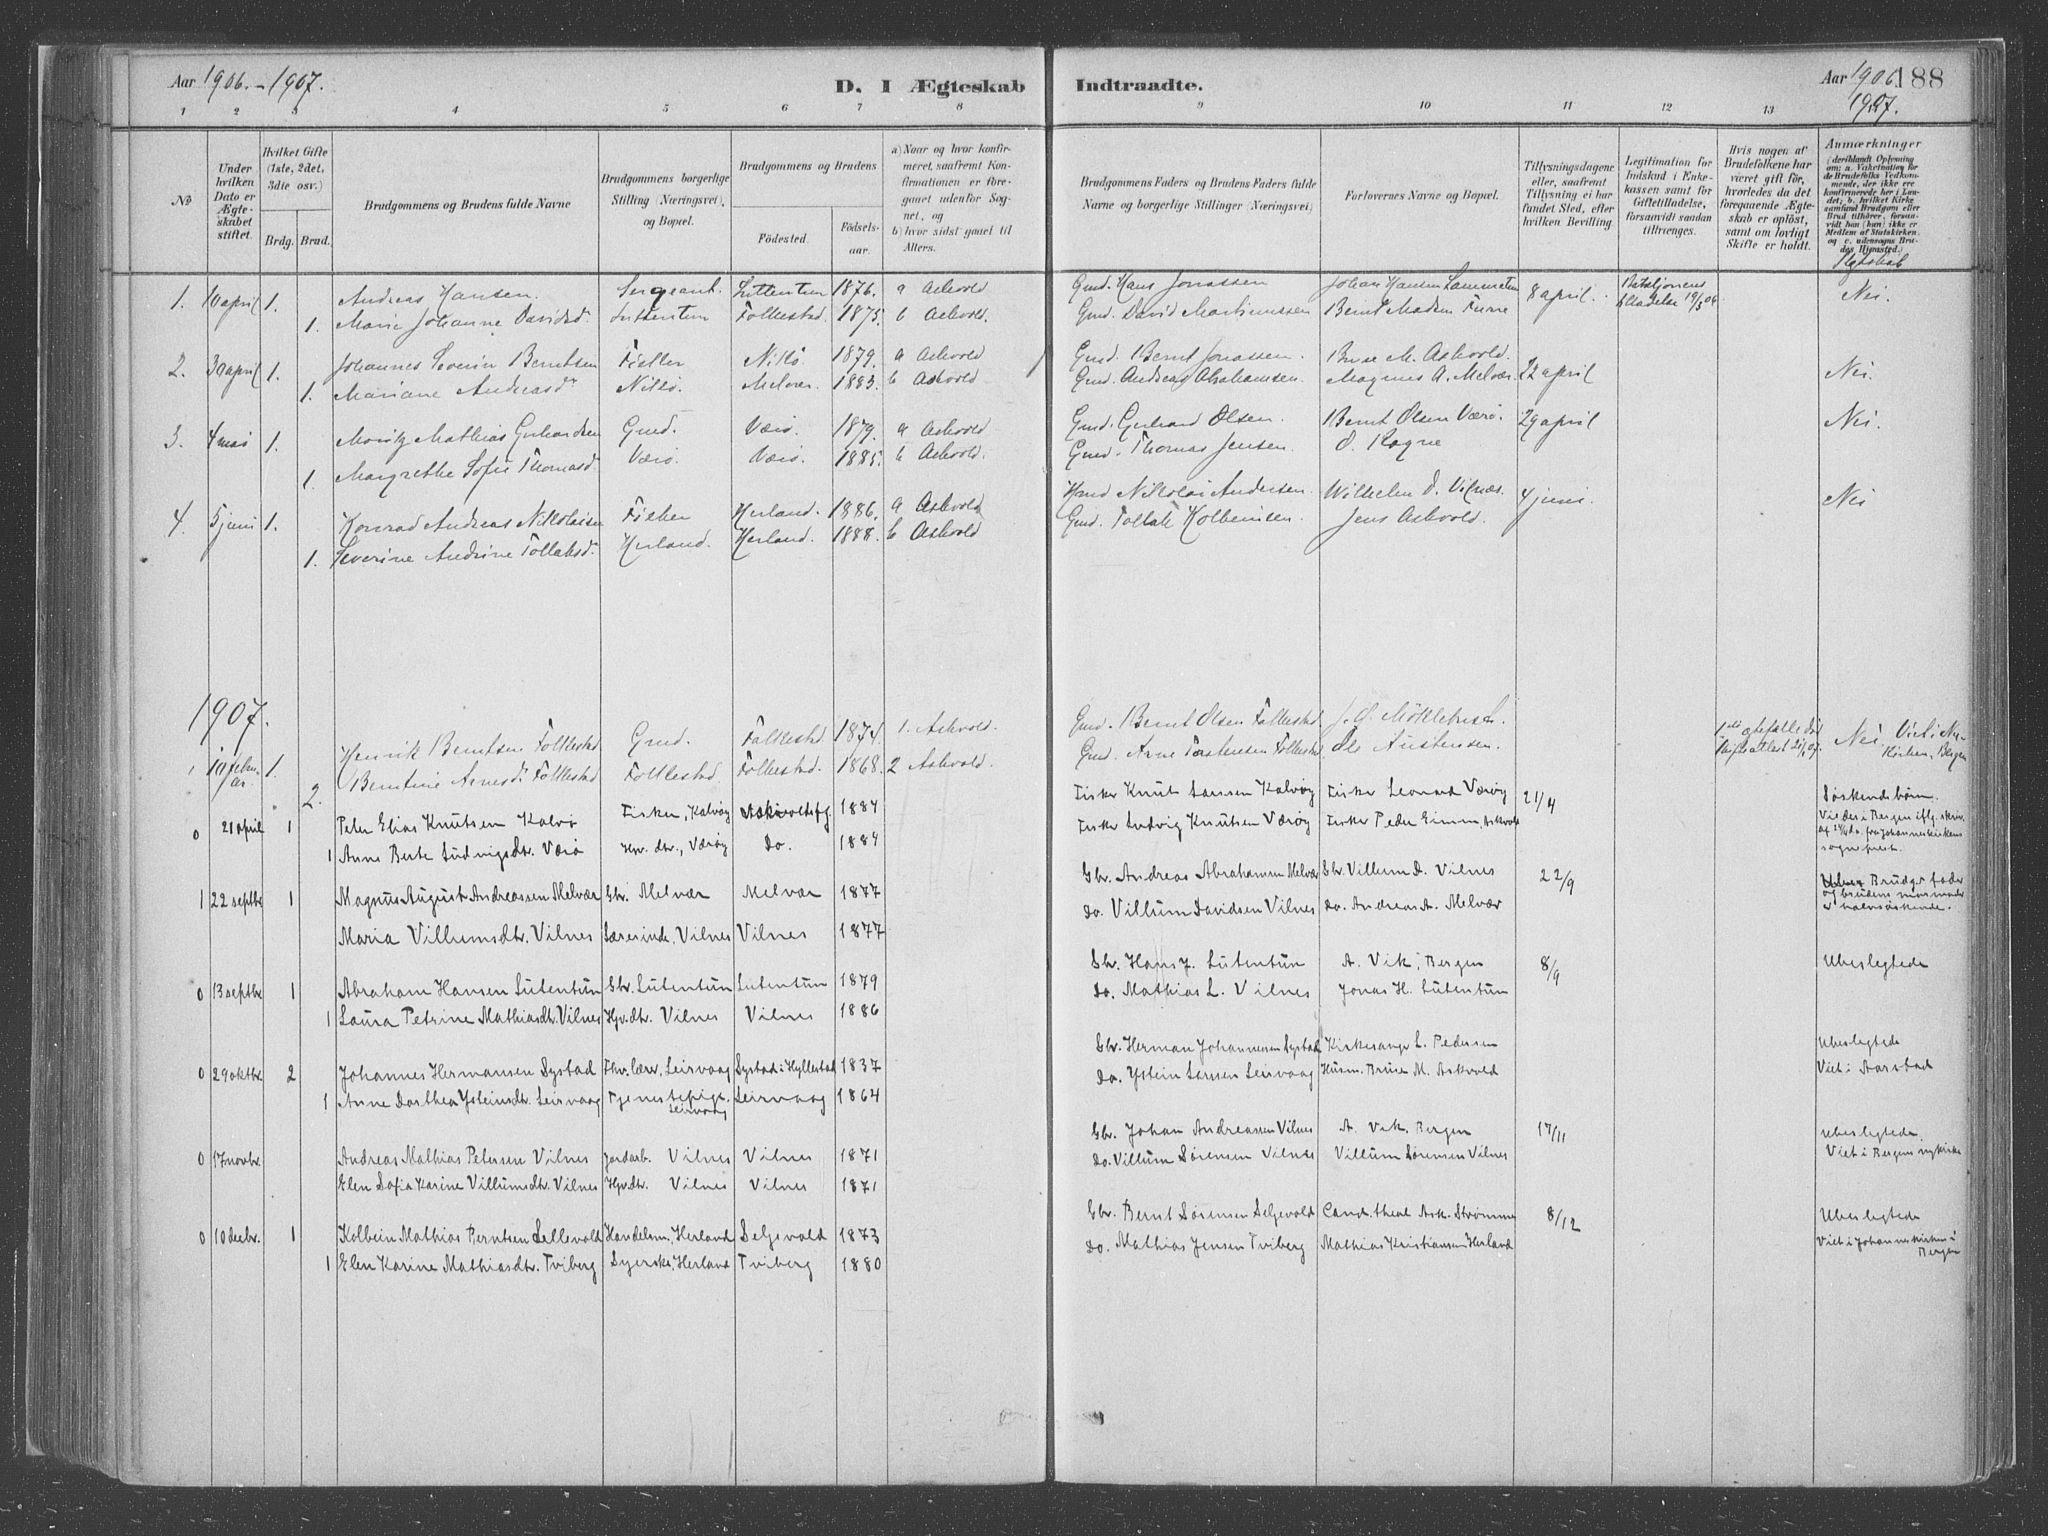 SAB, Askvoll sokneprestembete, H/Haa/Haac/L0001: Ministerialbok nr. C  1, 1879-1922, s. 188